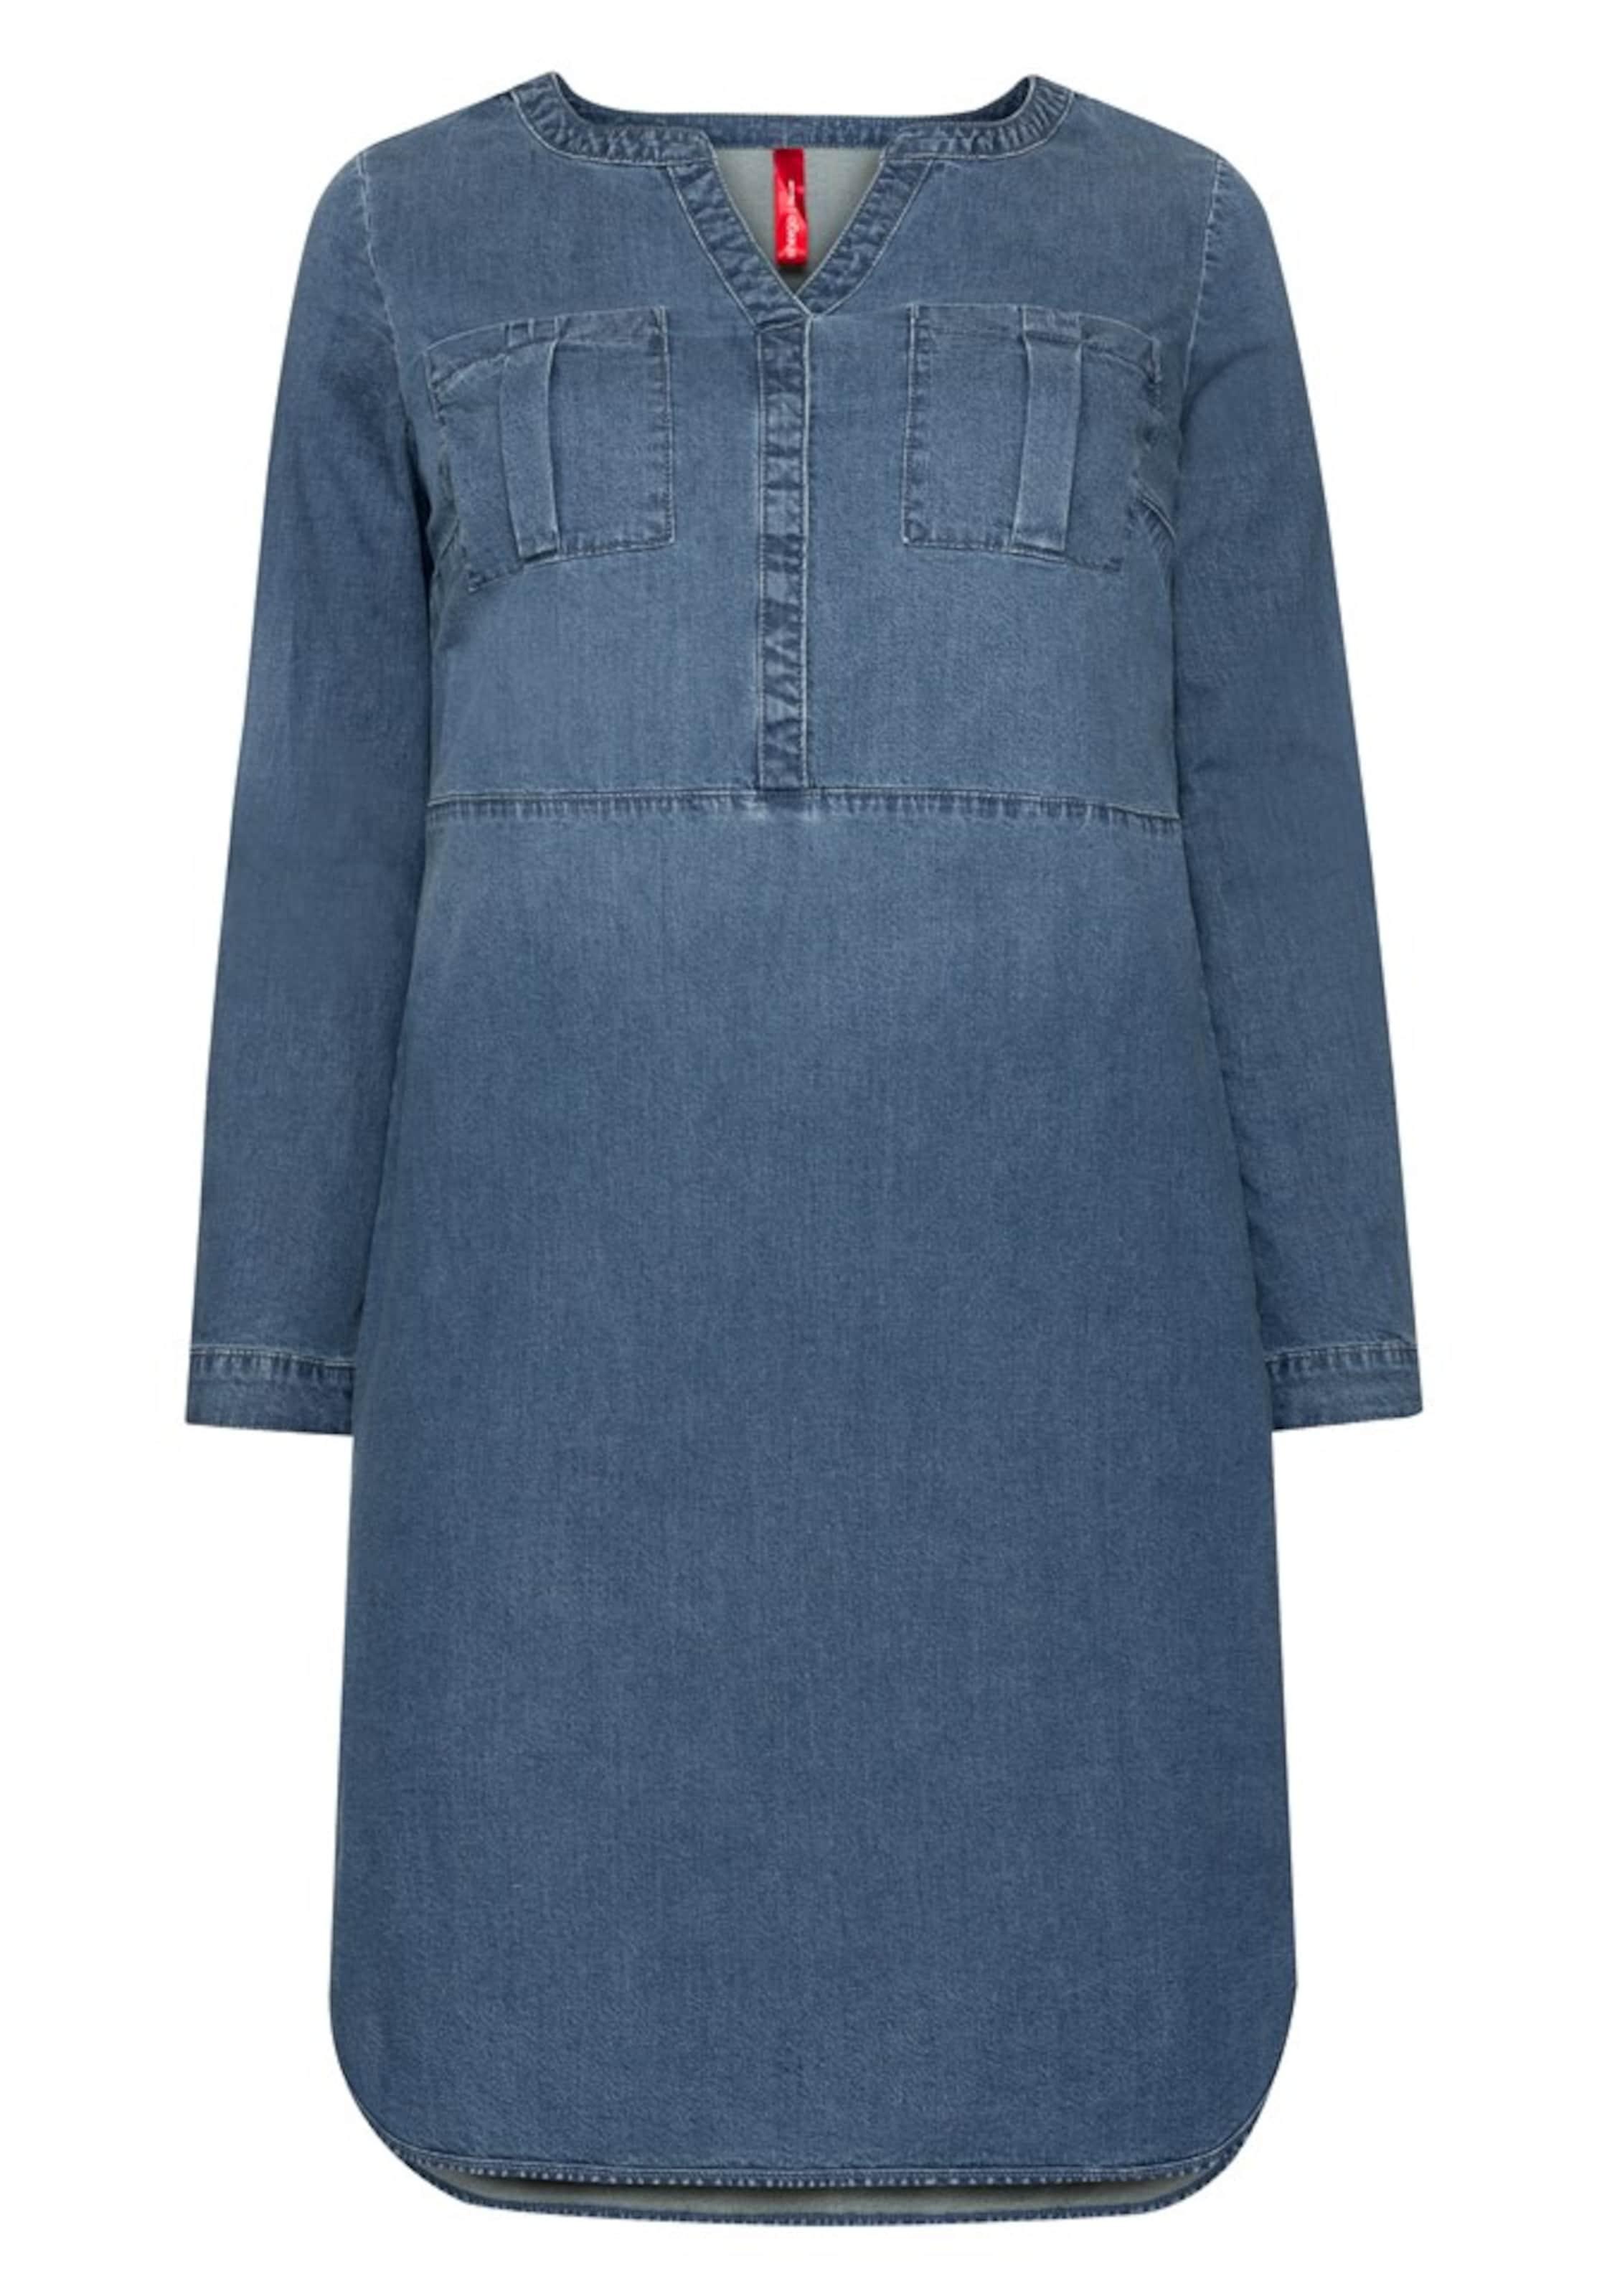 Sheego In In Kleid Blue Denim Blue Denim Kleid Denim In Sheego Sheego Kleid ID2E9H